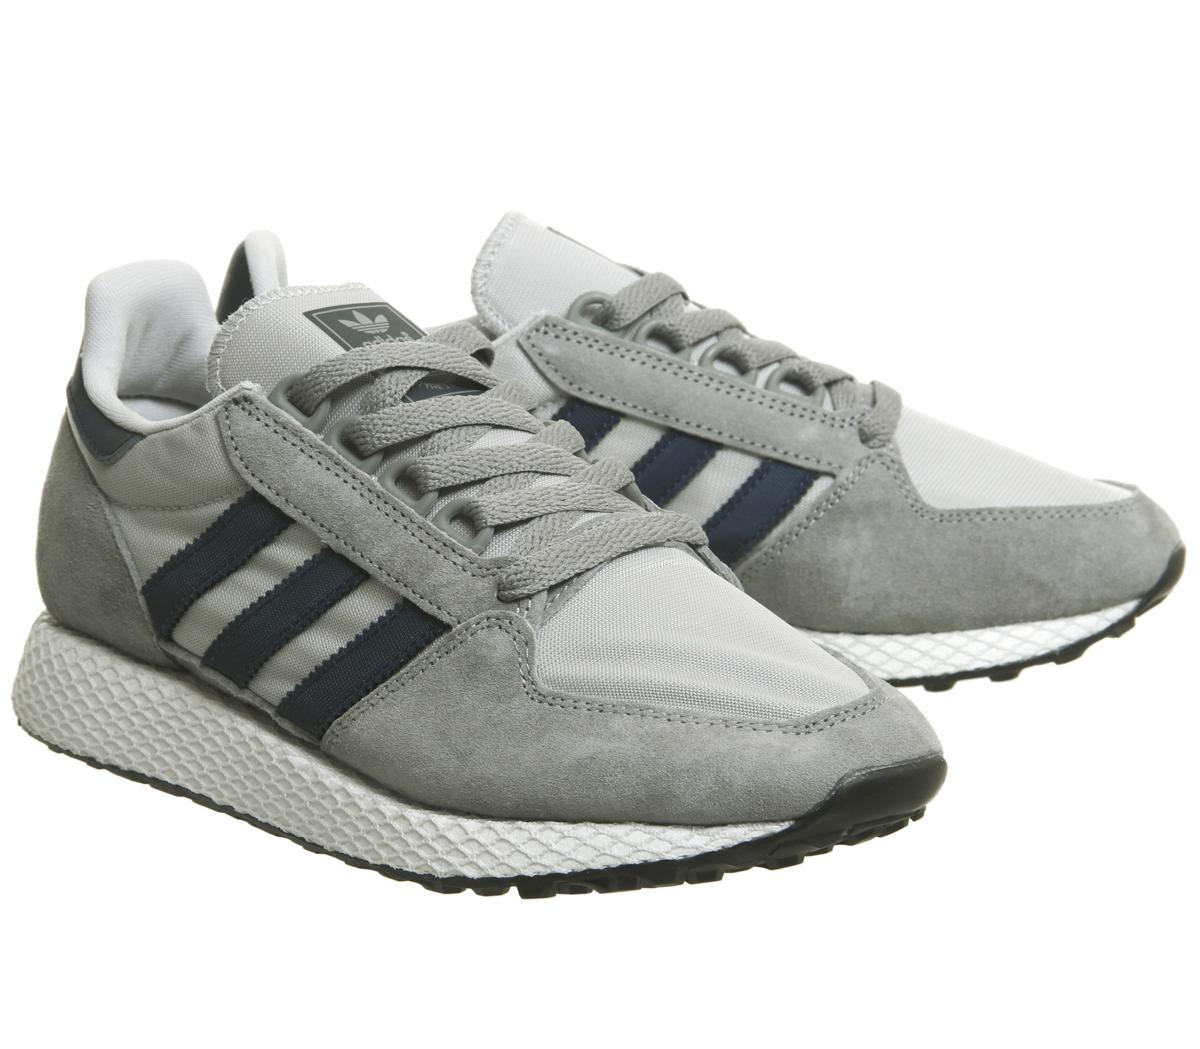 timeless design 16793 b7b4f Womens-Adidas-Forest-Grove-Trainers-Grey-Three-Collegiate-